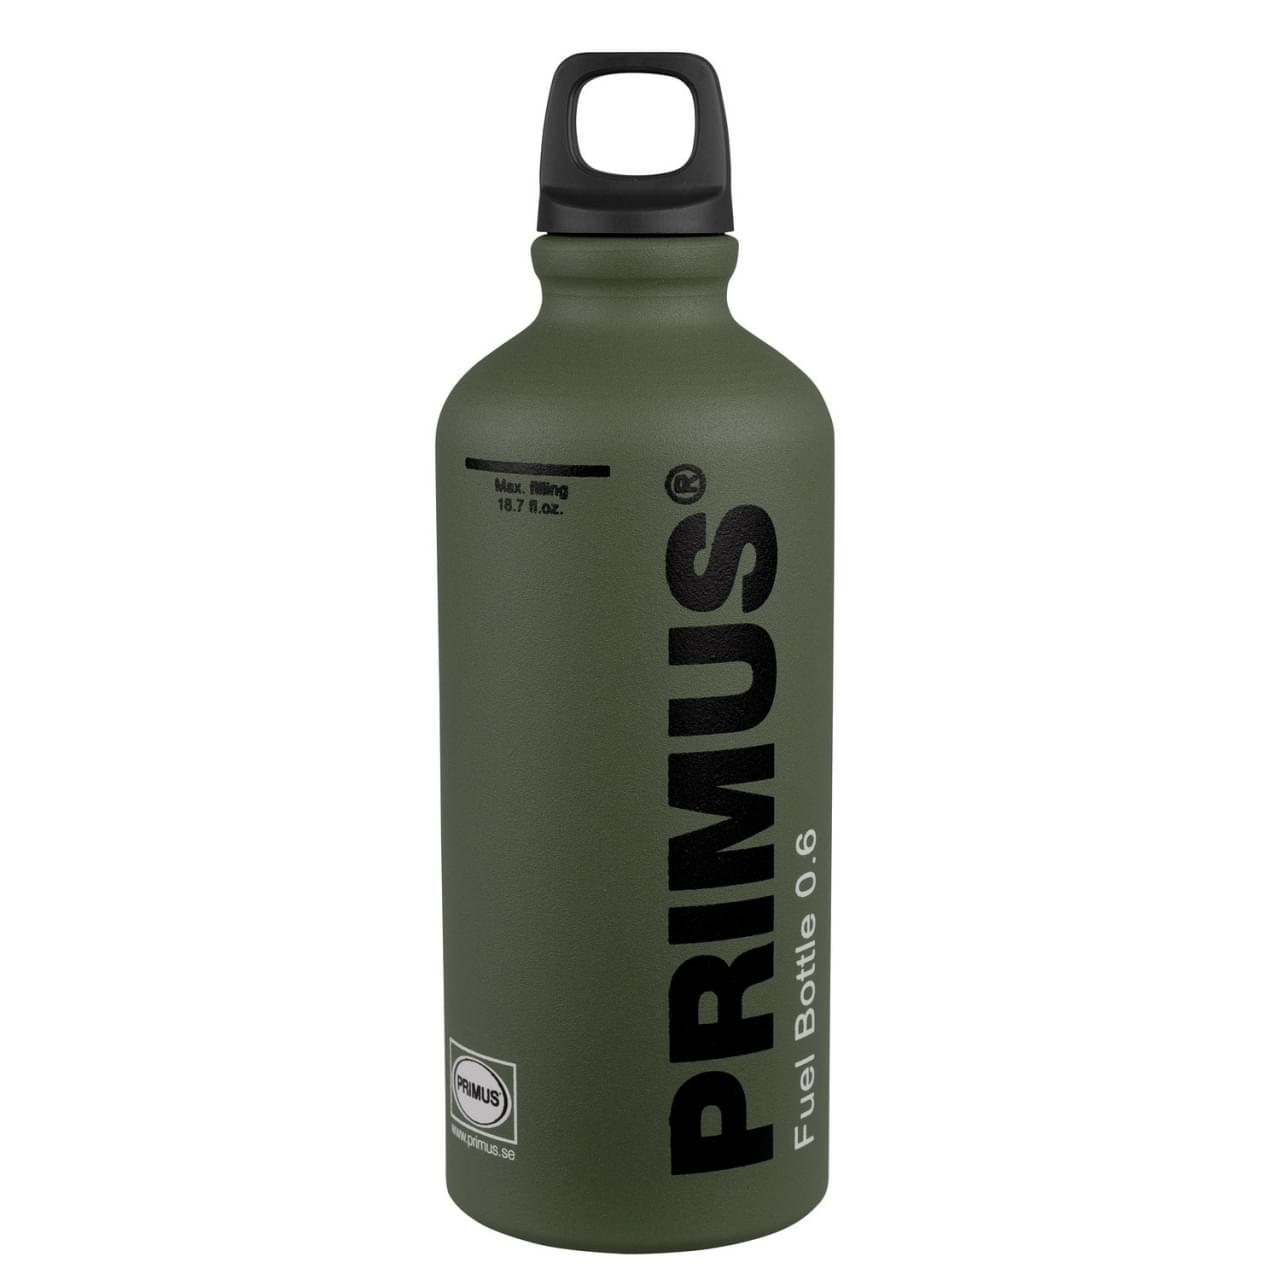 Primus Fuel Bottle 0.6 Brandstoffles